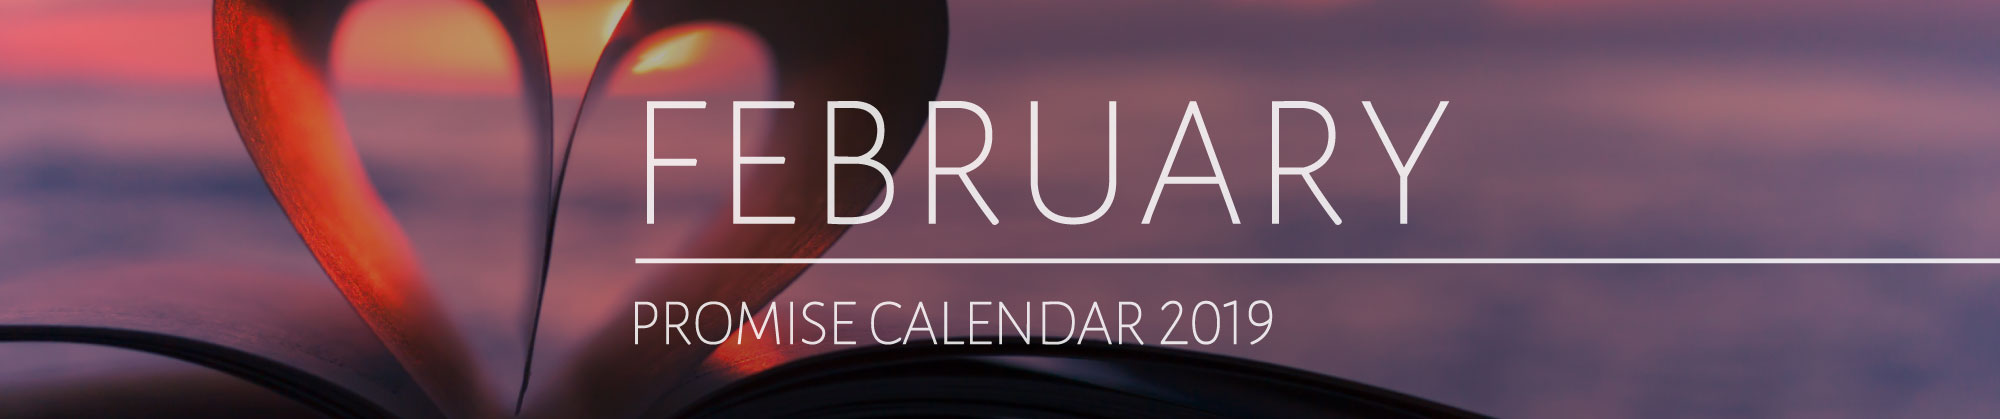 January 2019 Promise Calendar Header